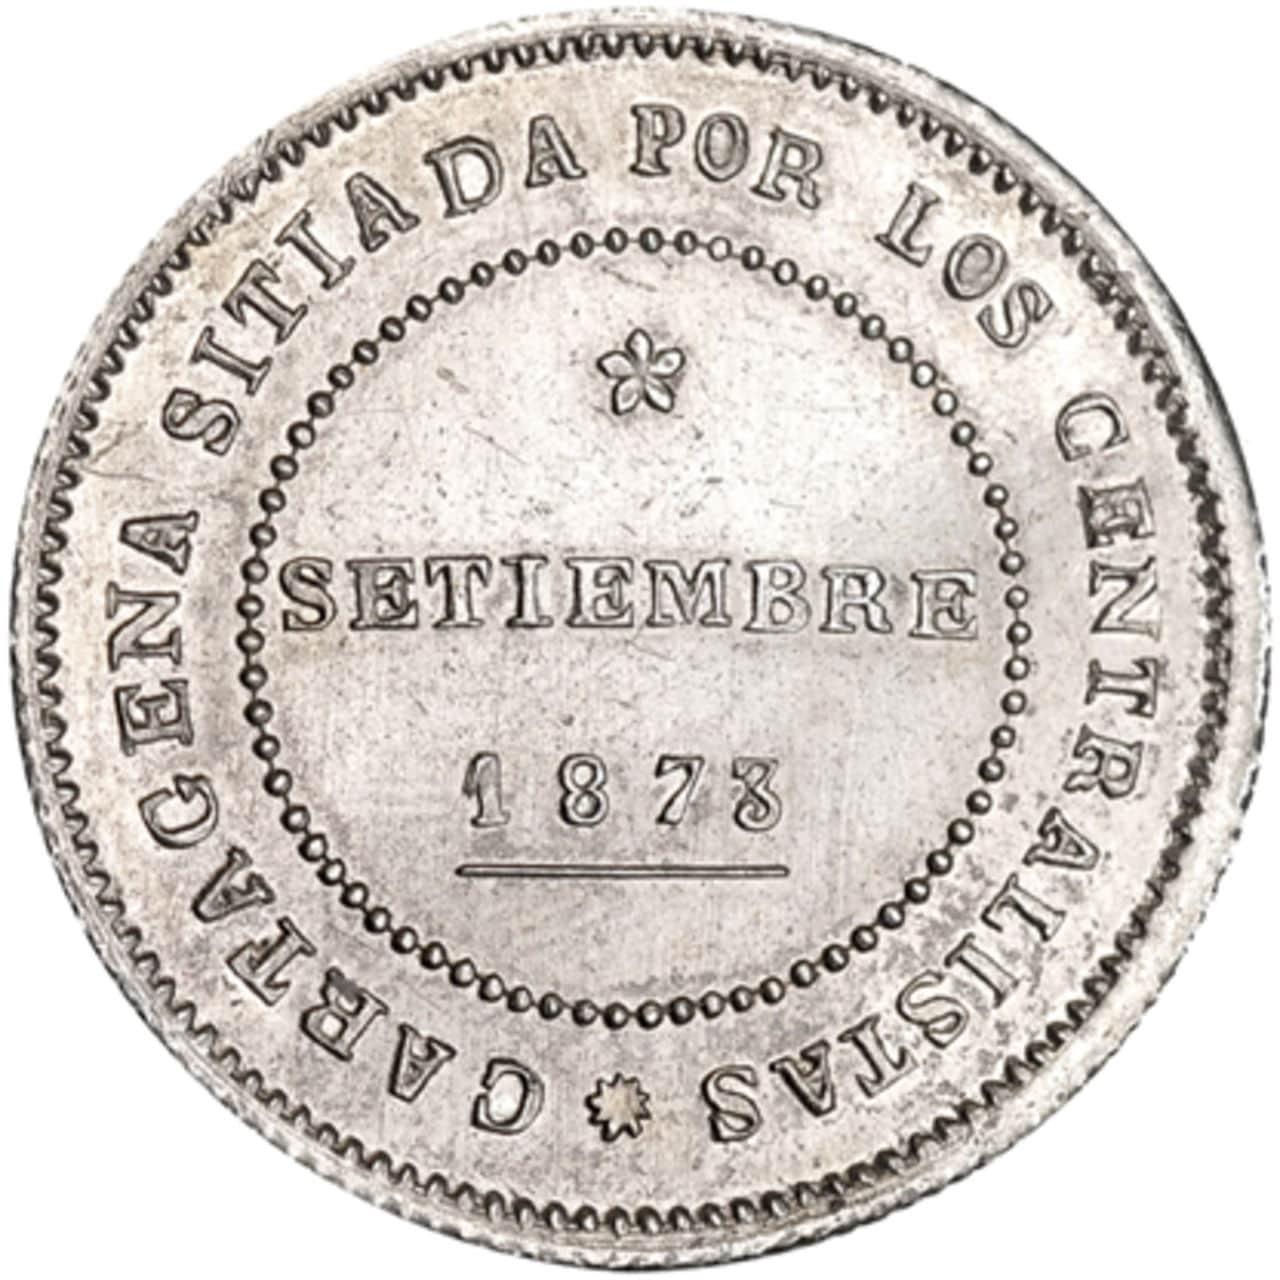 10 reales. 1873. Cartagena. Milagros Jover Navarro dedit, mi madre. 738r